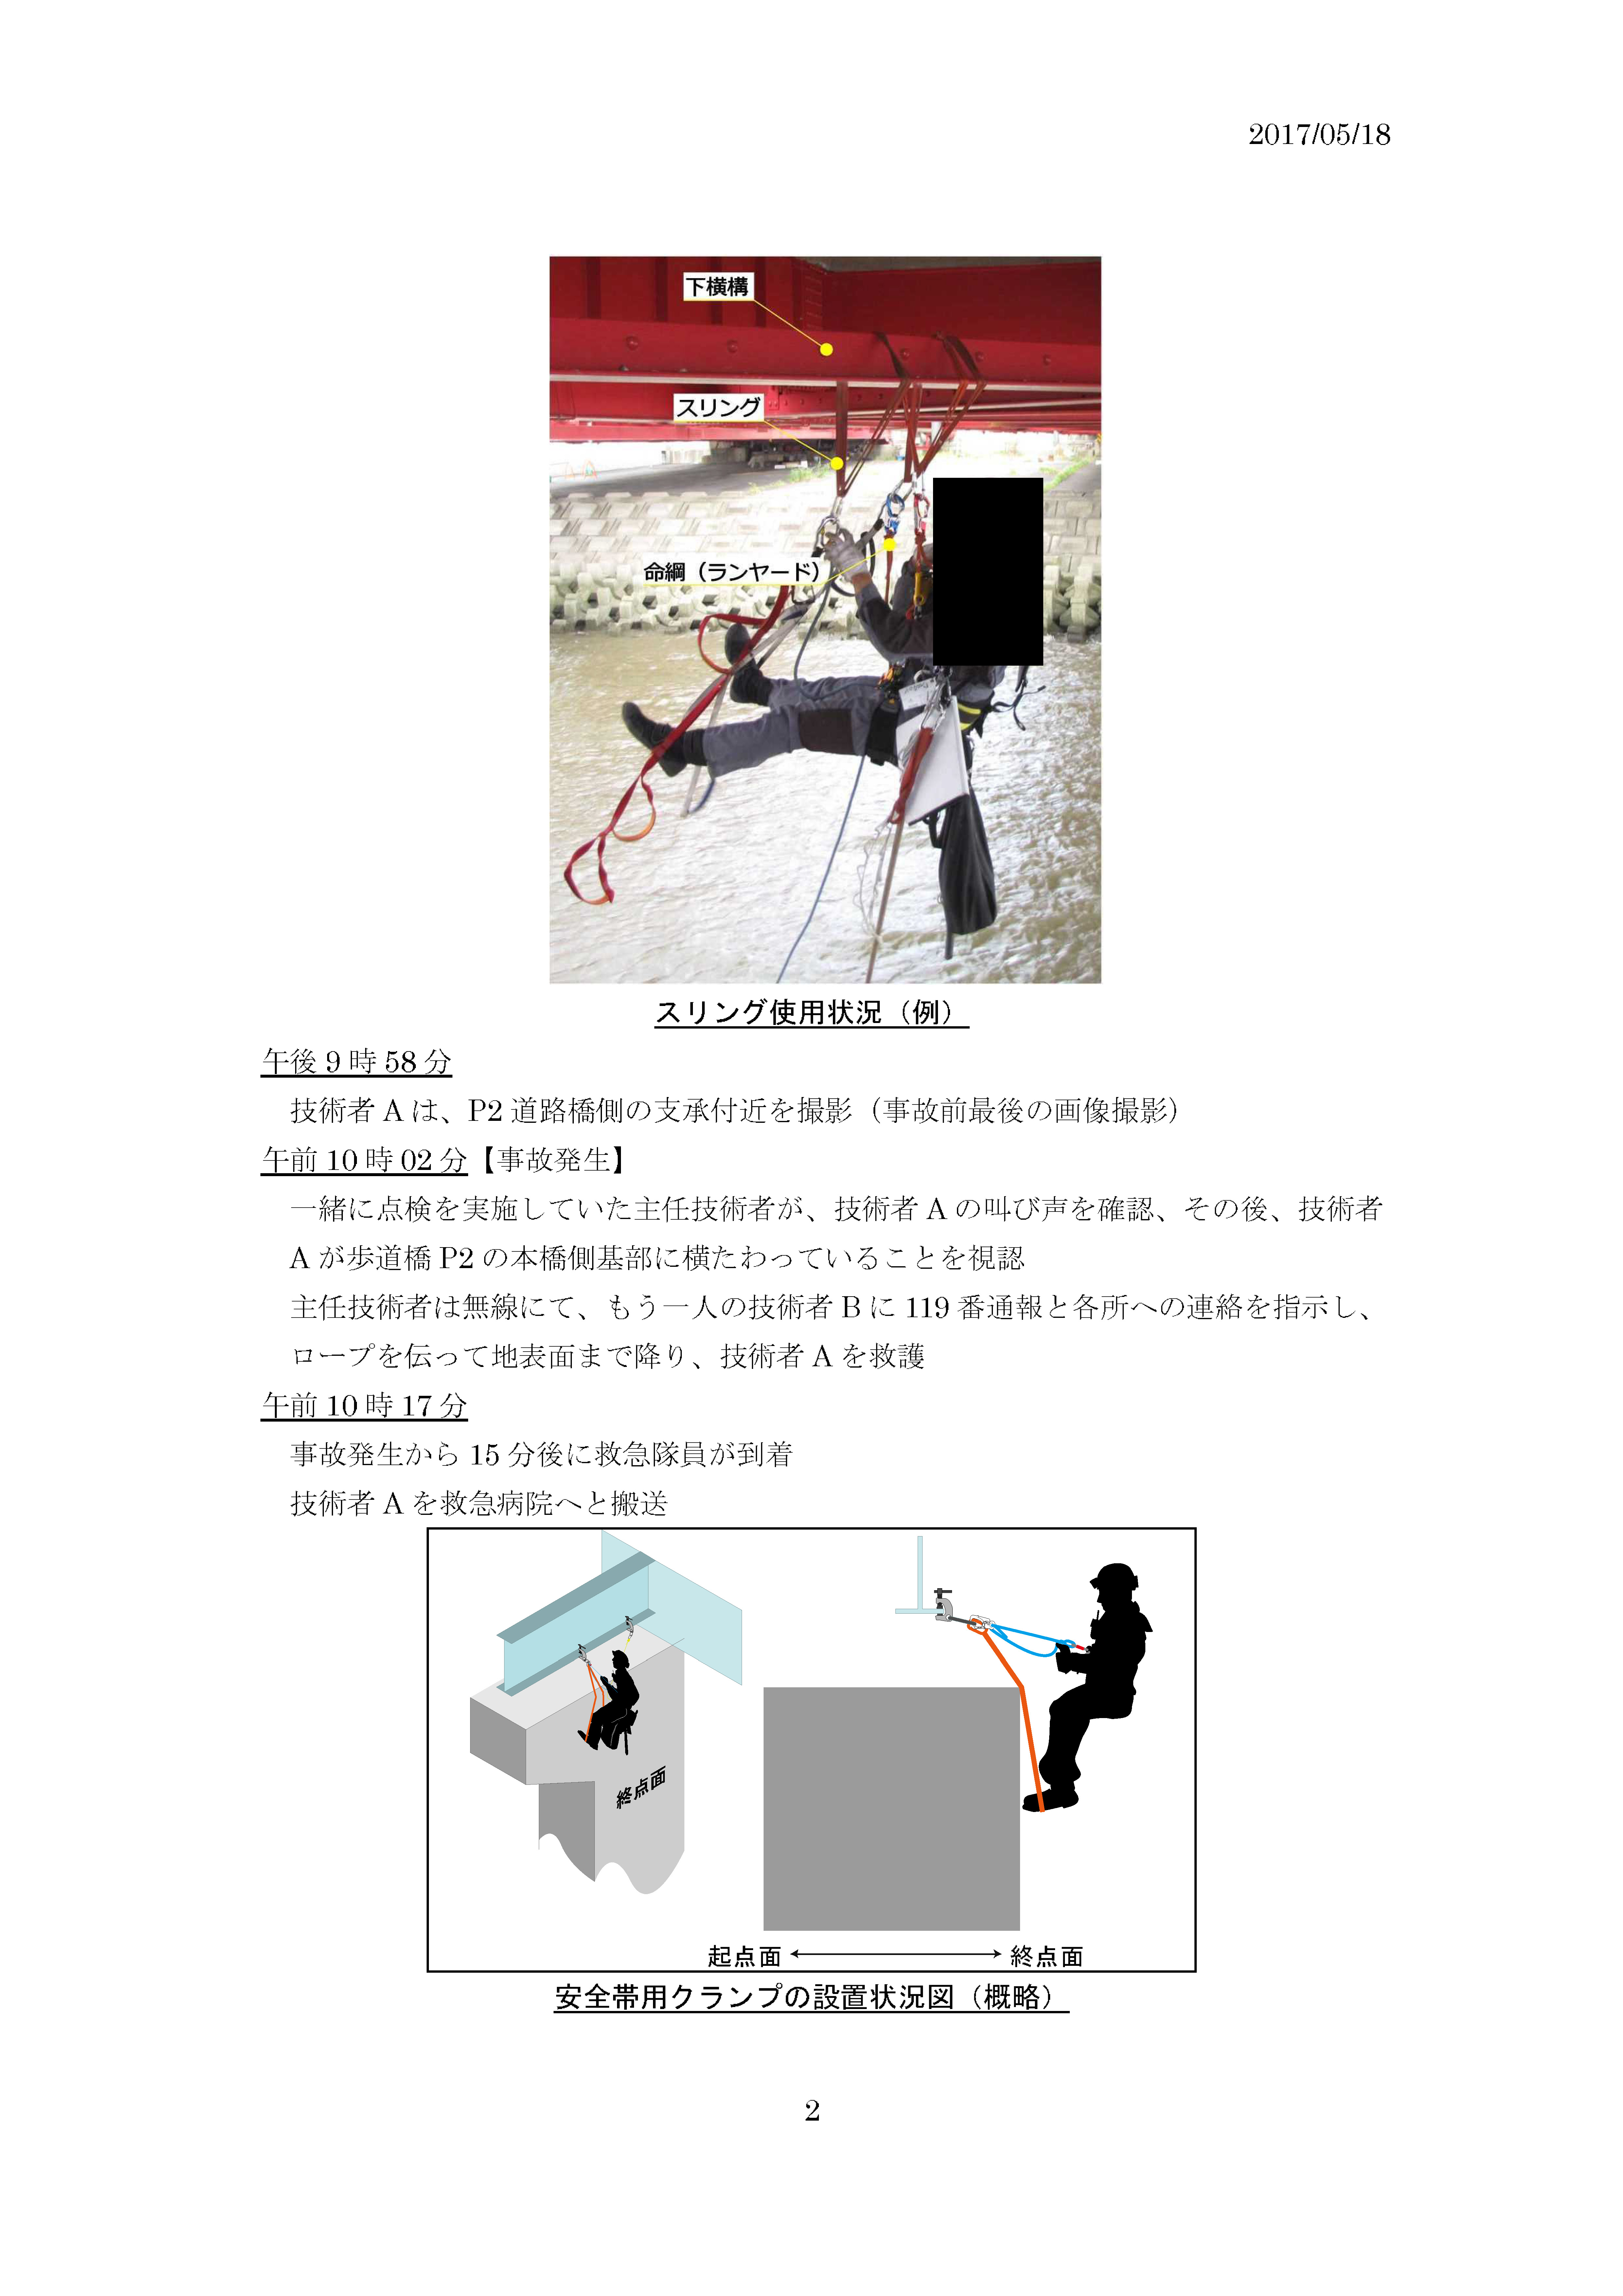 特殊高所技術の事故